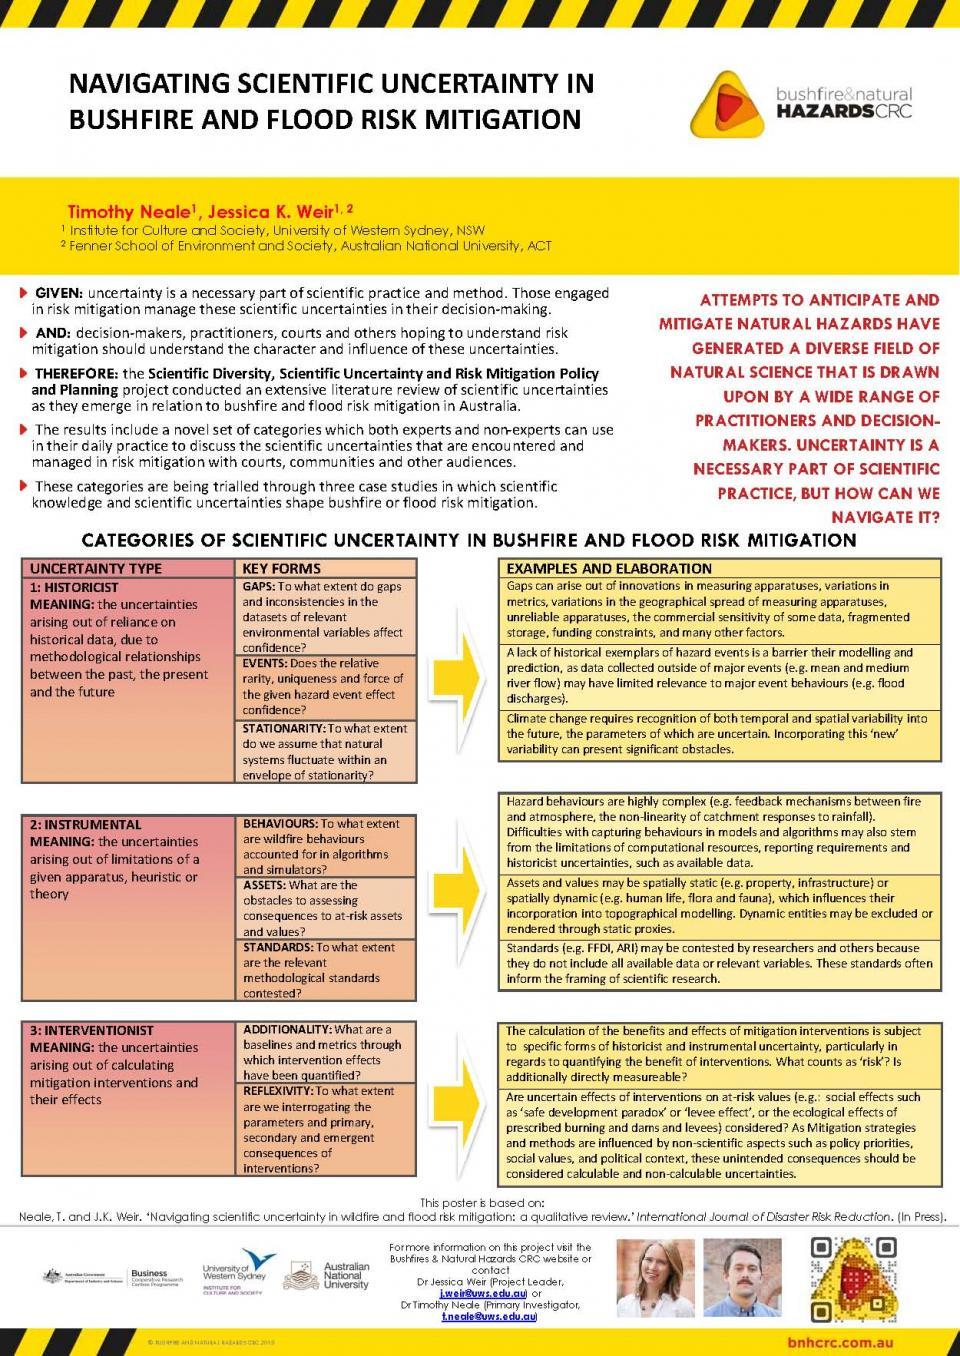 Navigating scientific uncertainty in bushfire and flood risk mitigation